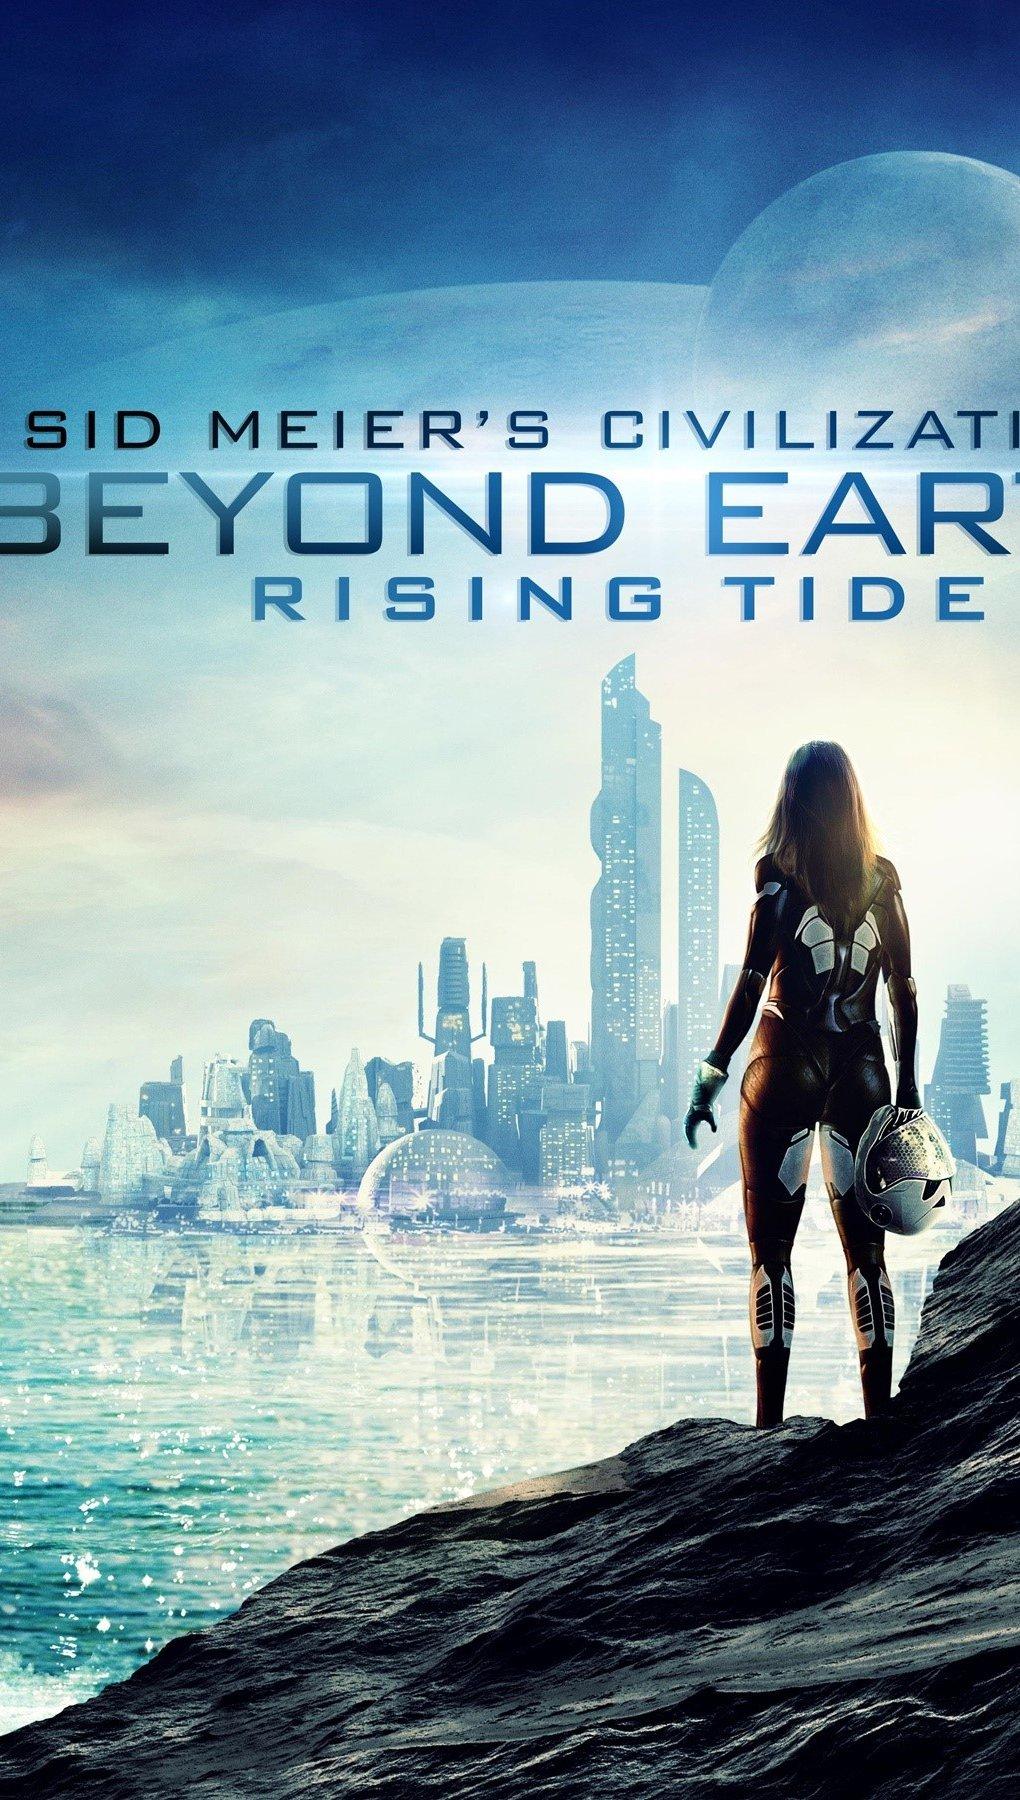 Wallpaper Sid meier's Civilization Beyond Earth Vertical